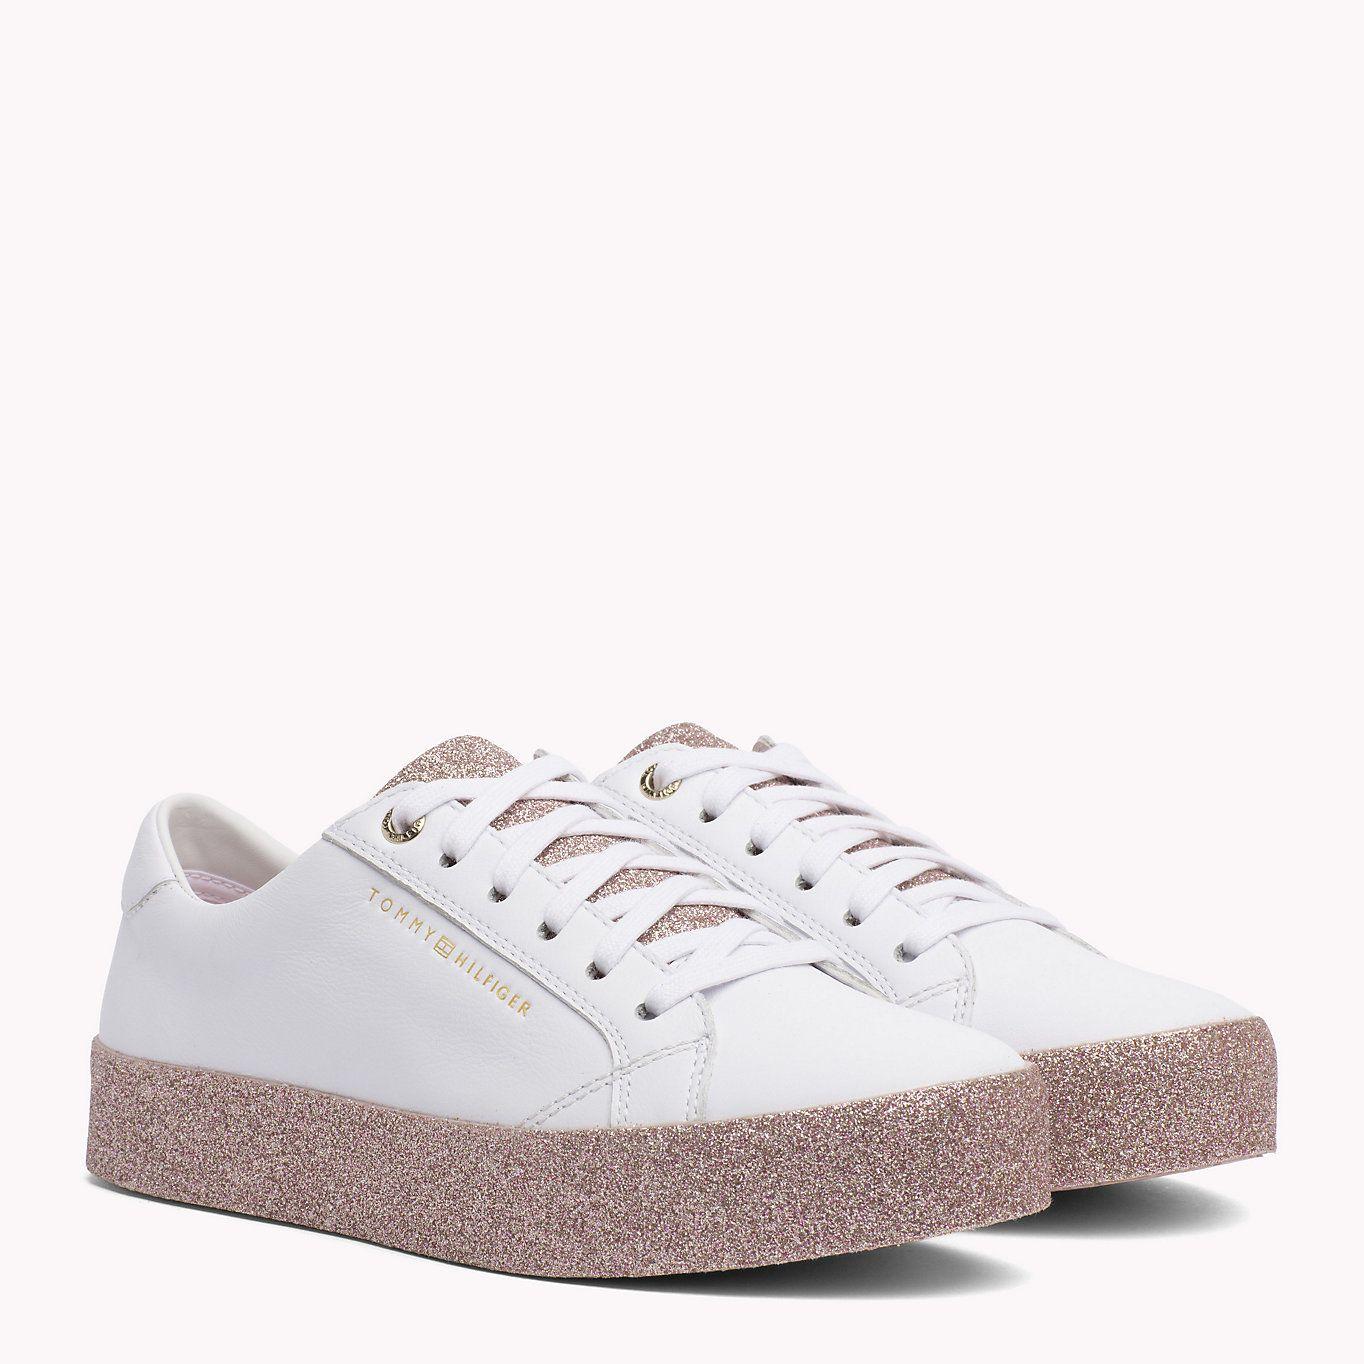 premium selection 16c85 24d3e TOMMY HILFIGER Sparkle Flatform Trainers - WHITE-PINK ...